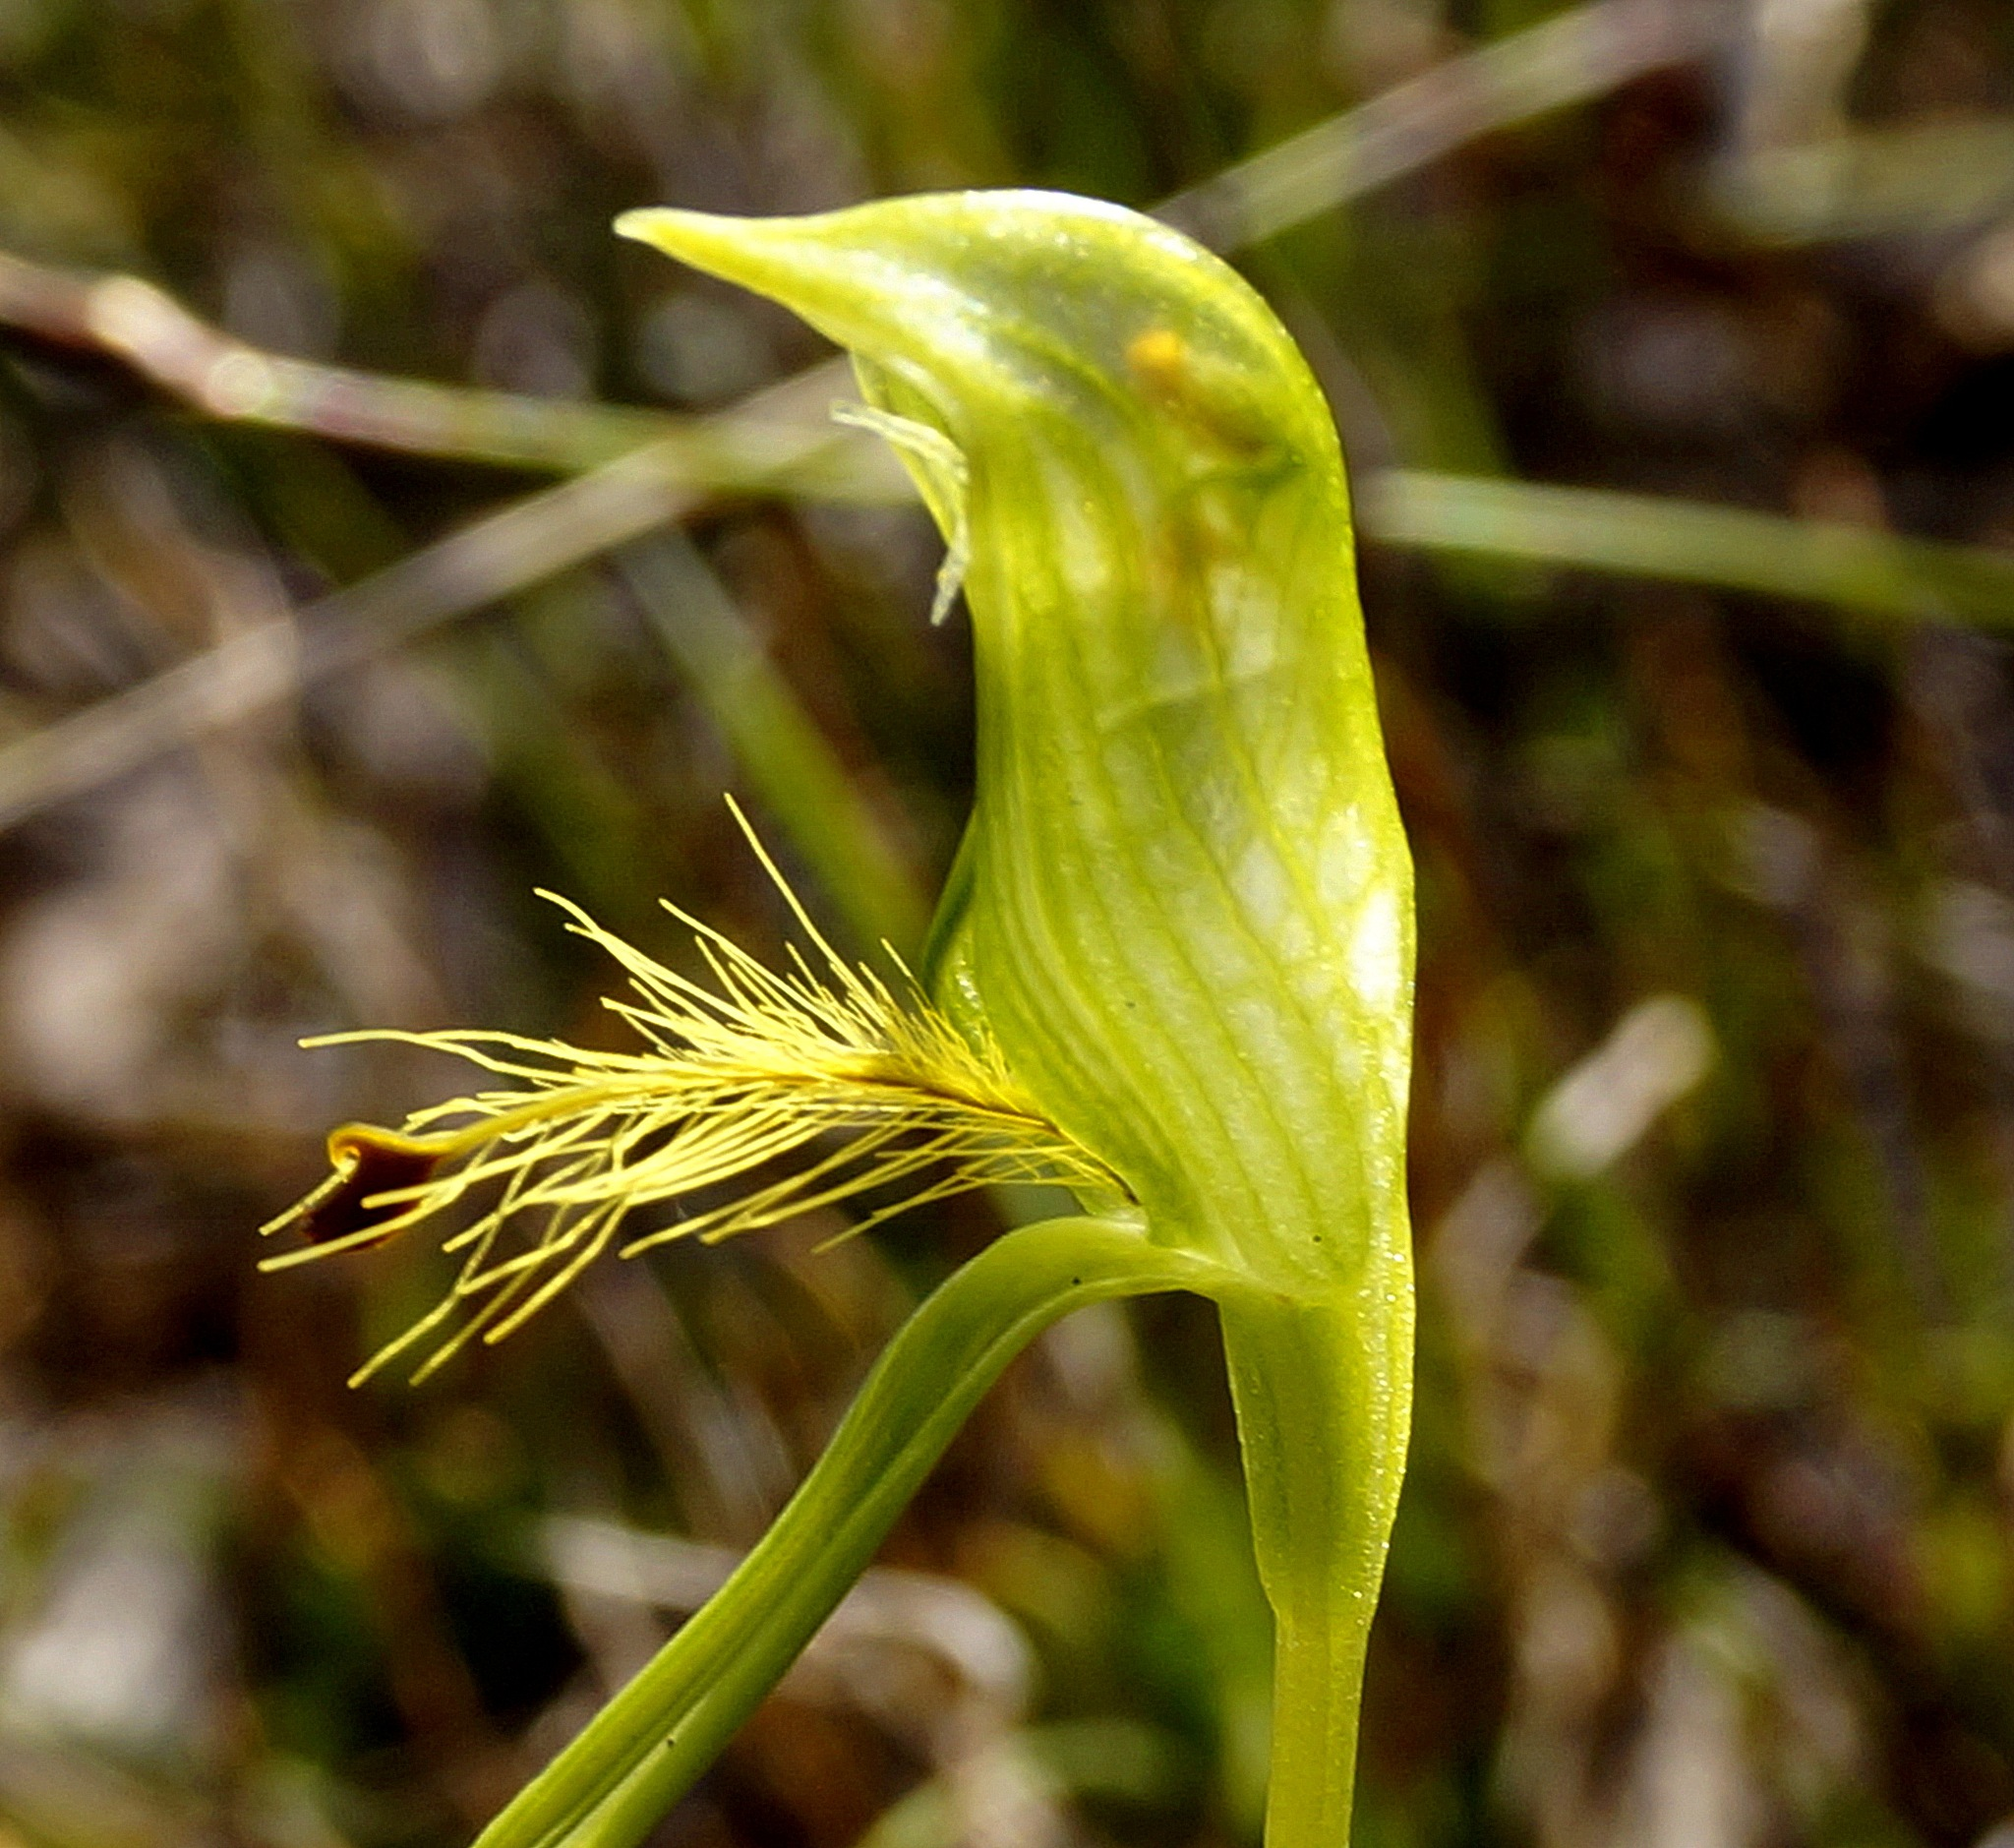 Bearded Greenhood Orchid - Pterostylis plumosa by PeterE